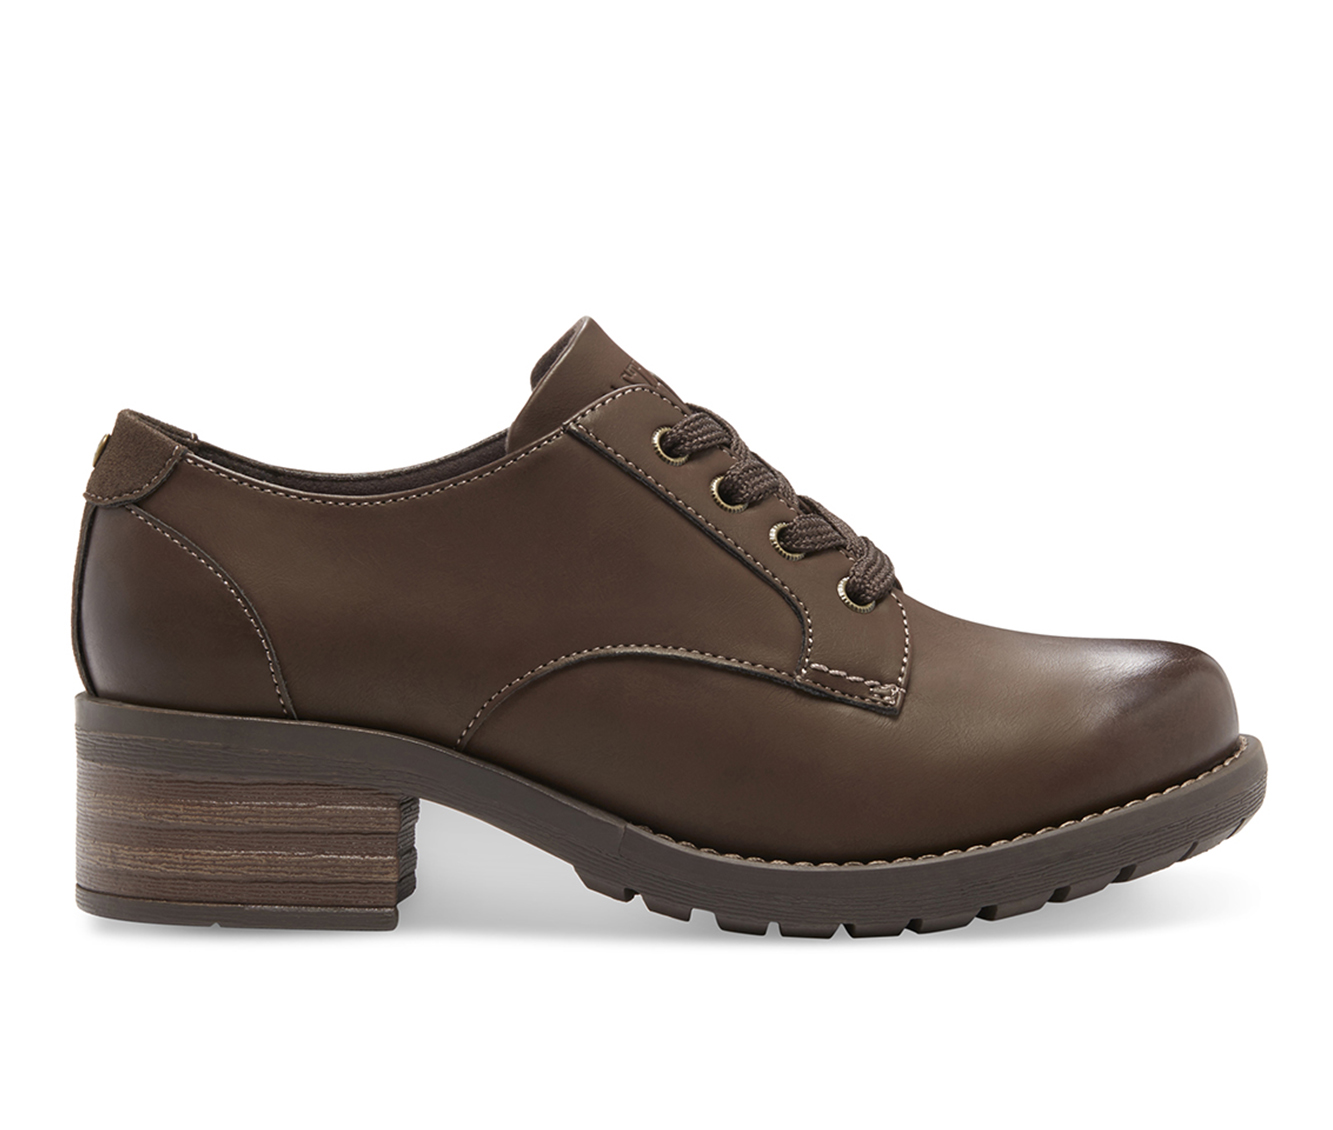 Eastland Trish Women's Shoe (Brown Leather)